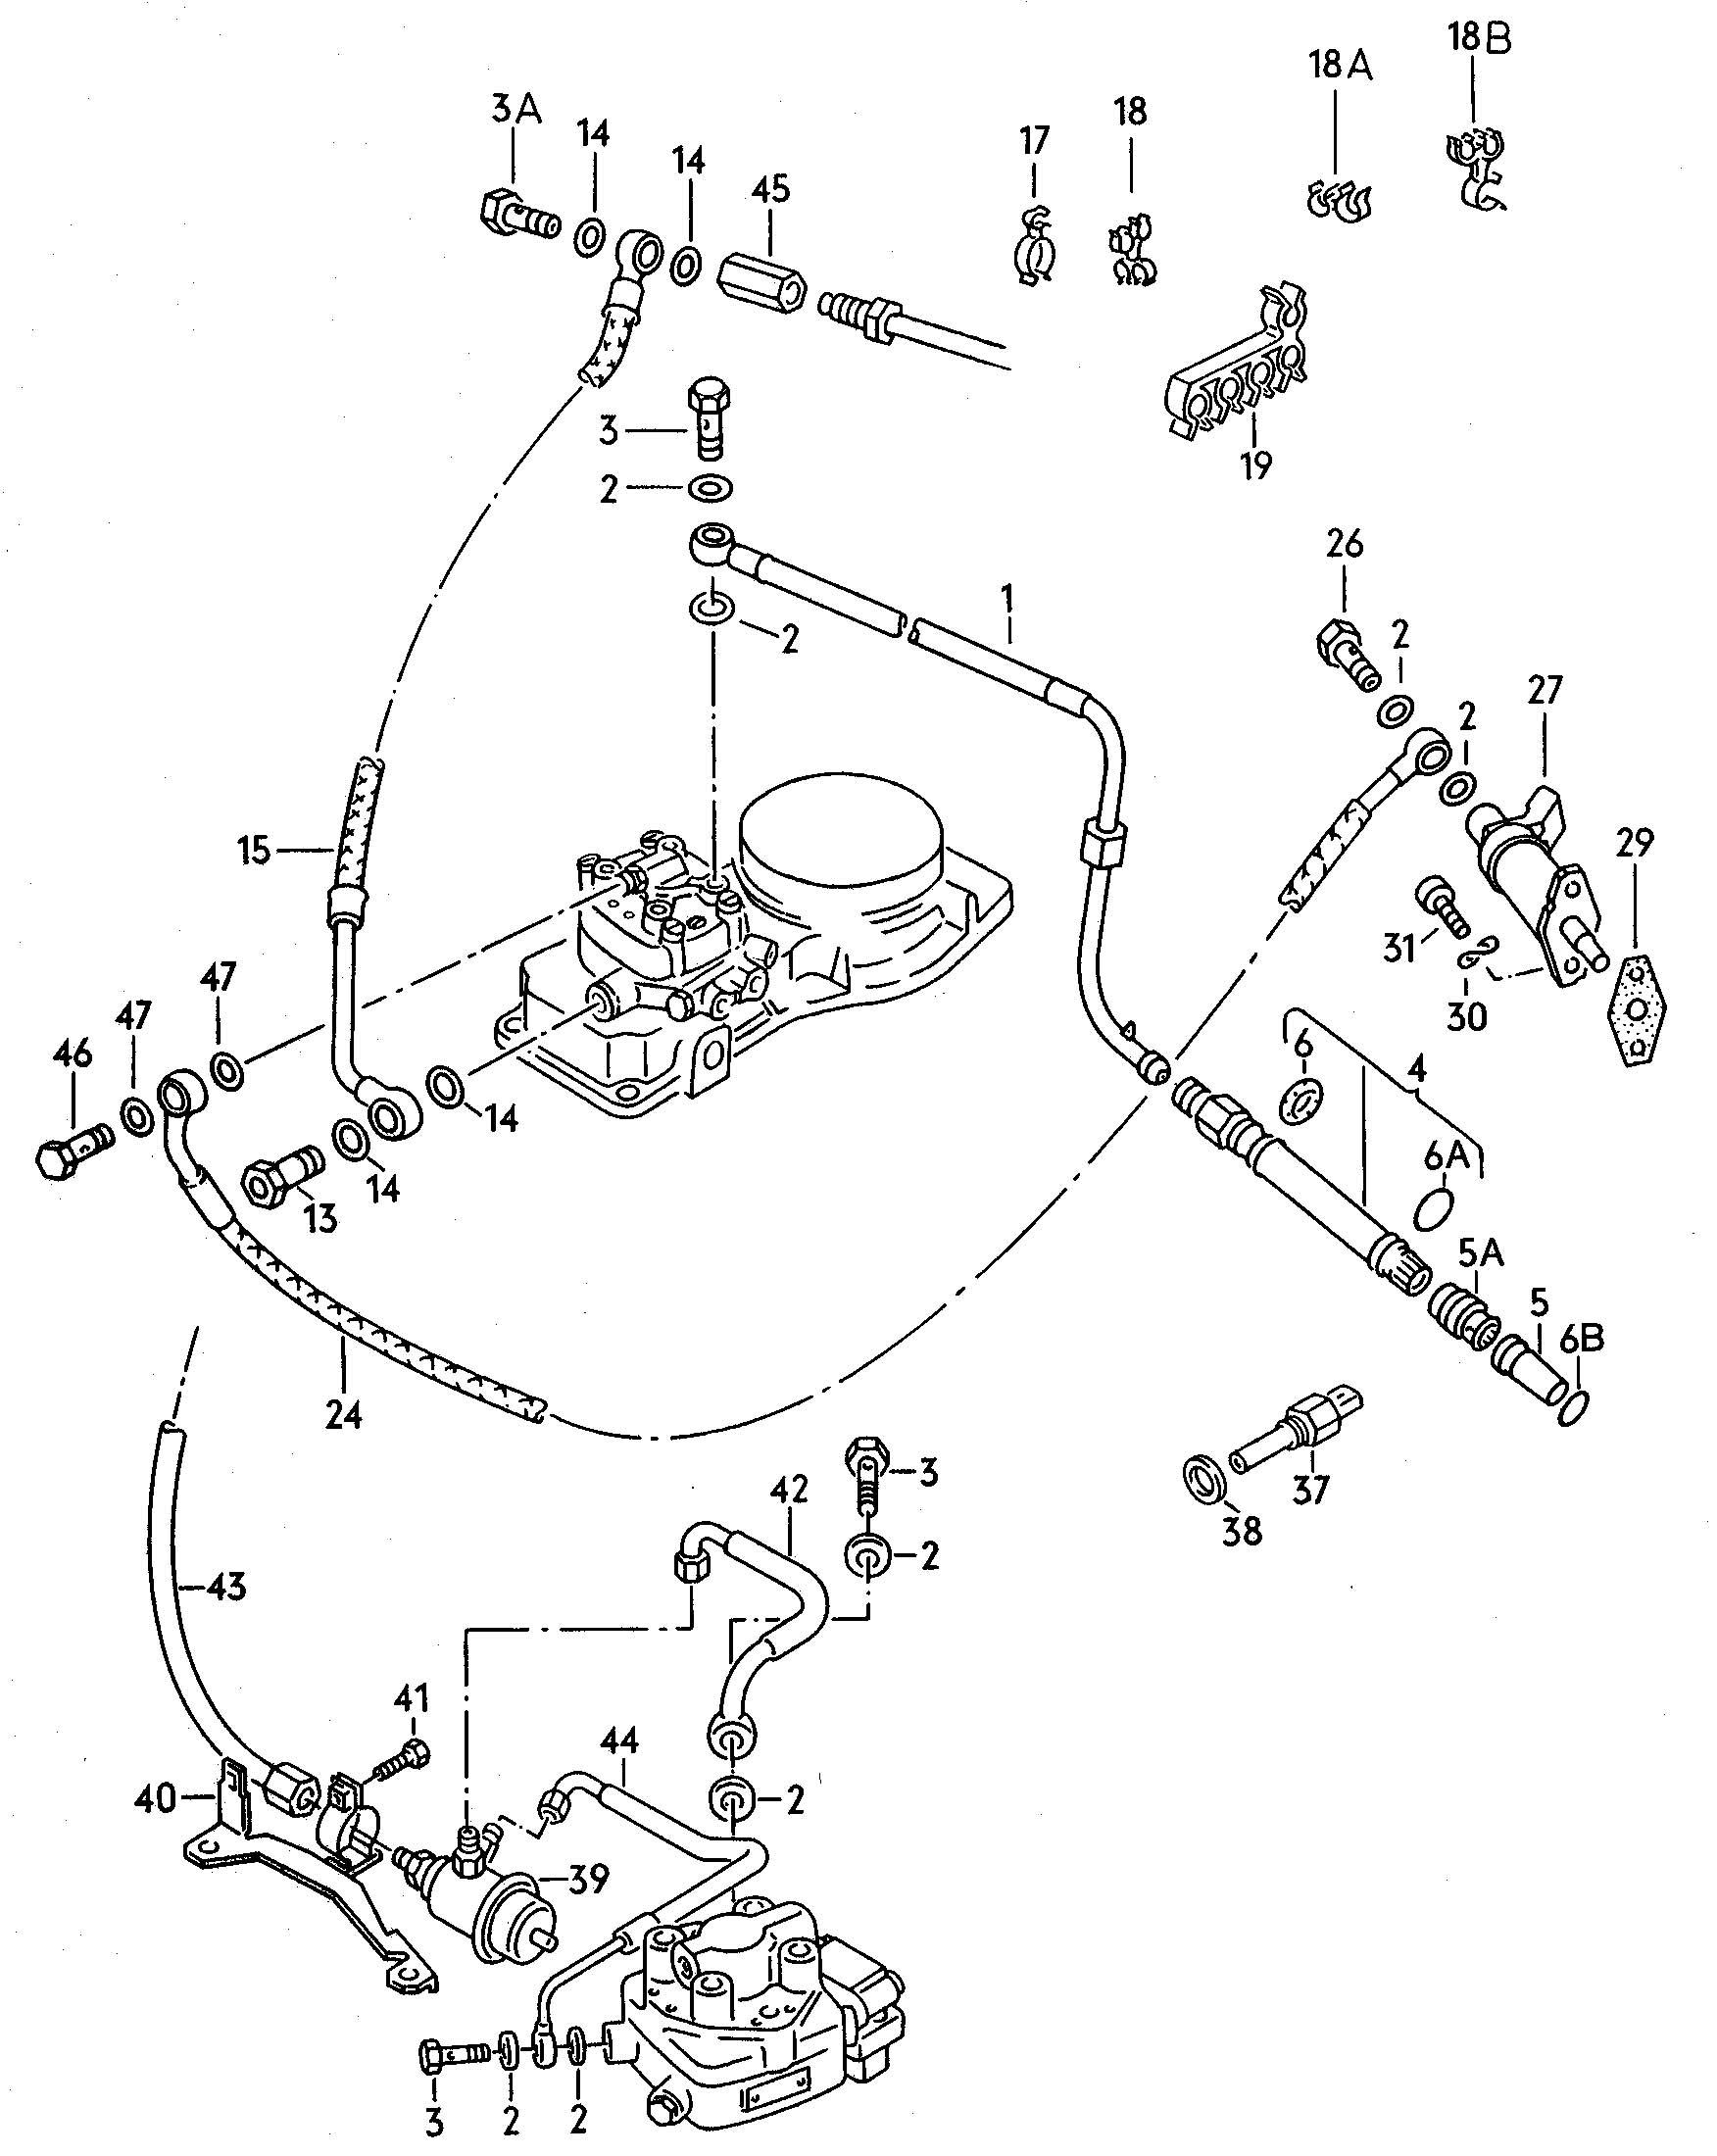 1988 vw cabriolet engine diagram